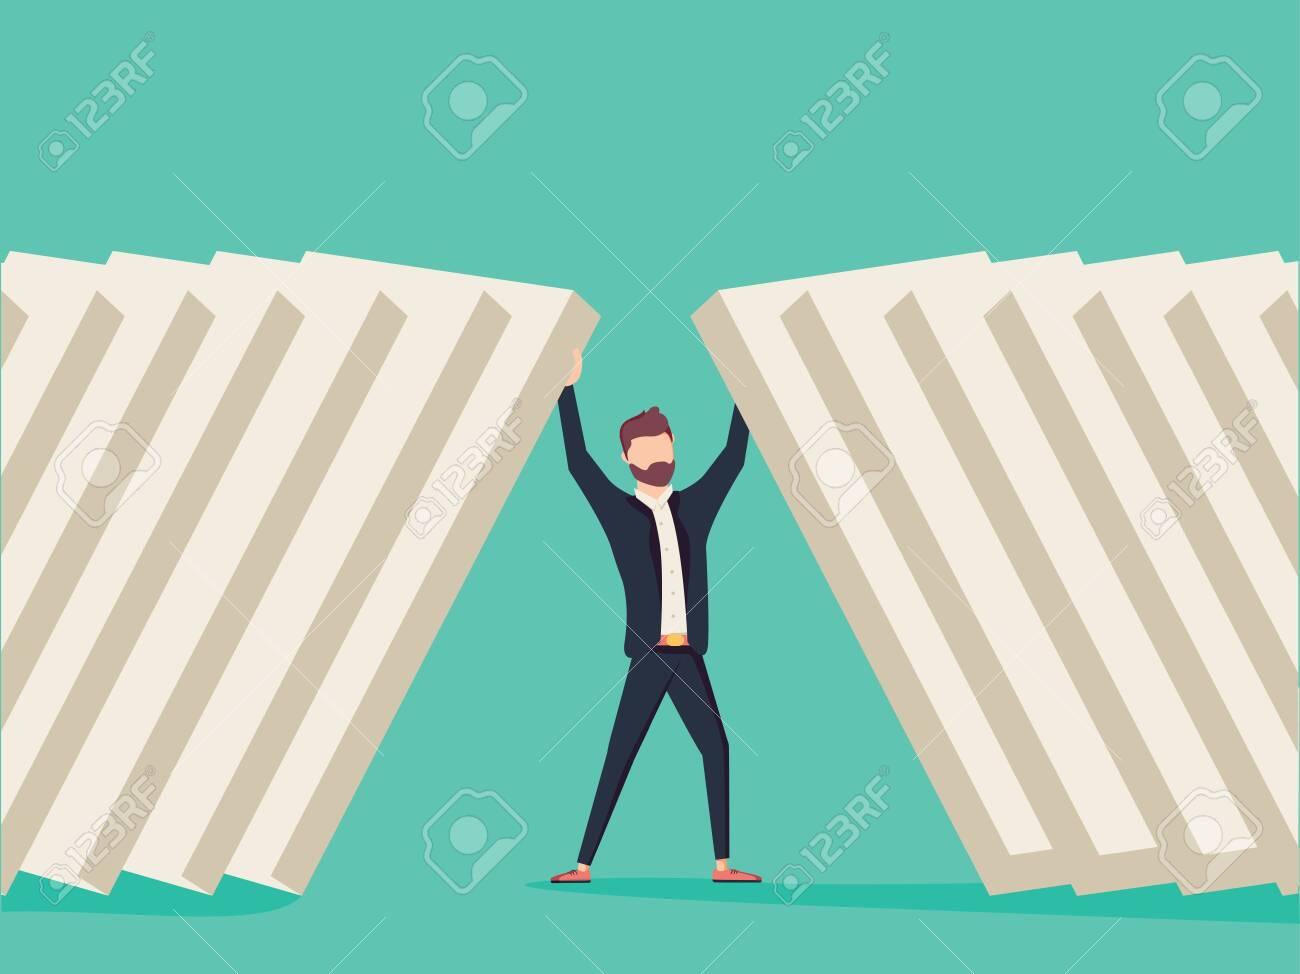 Businessman holding domino bricks. Symbol of determination, focus and business success. - 132302547